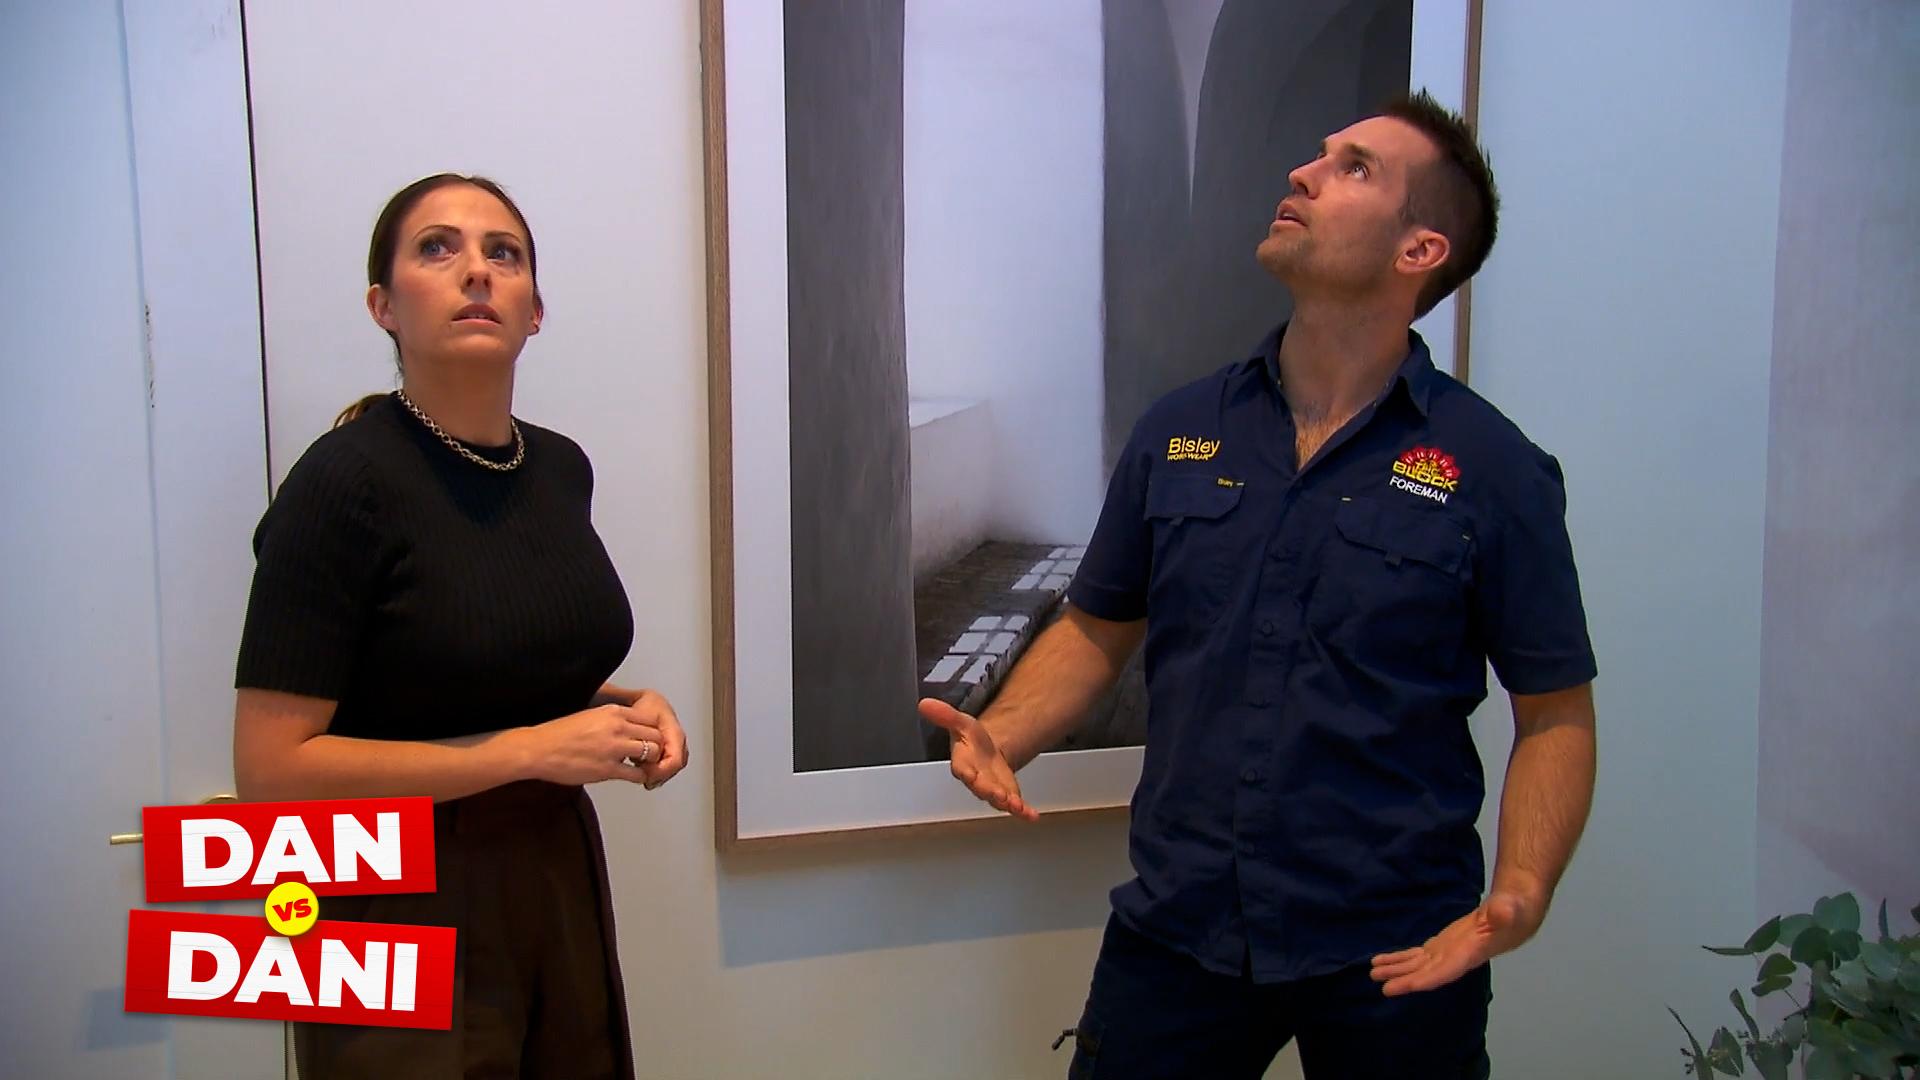 Dan vs Dani: One Guest Bedroom slammed for 'silly decisions'